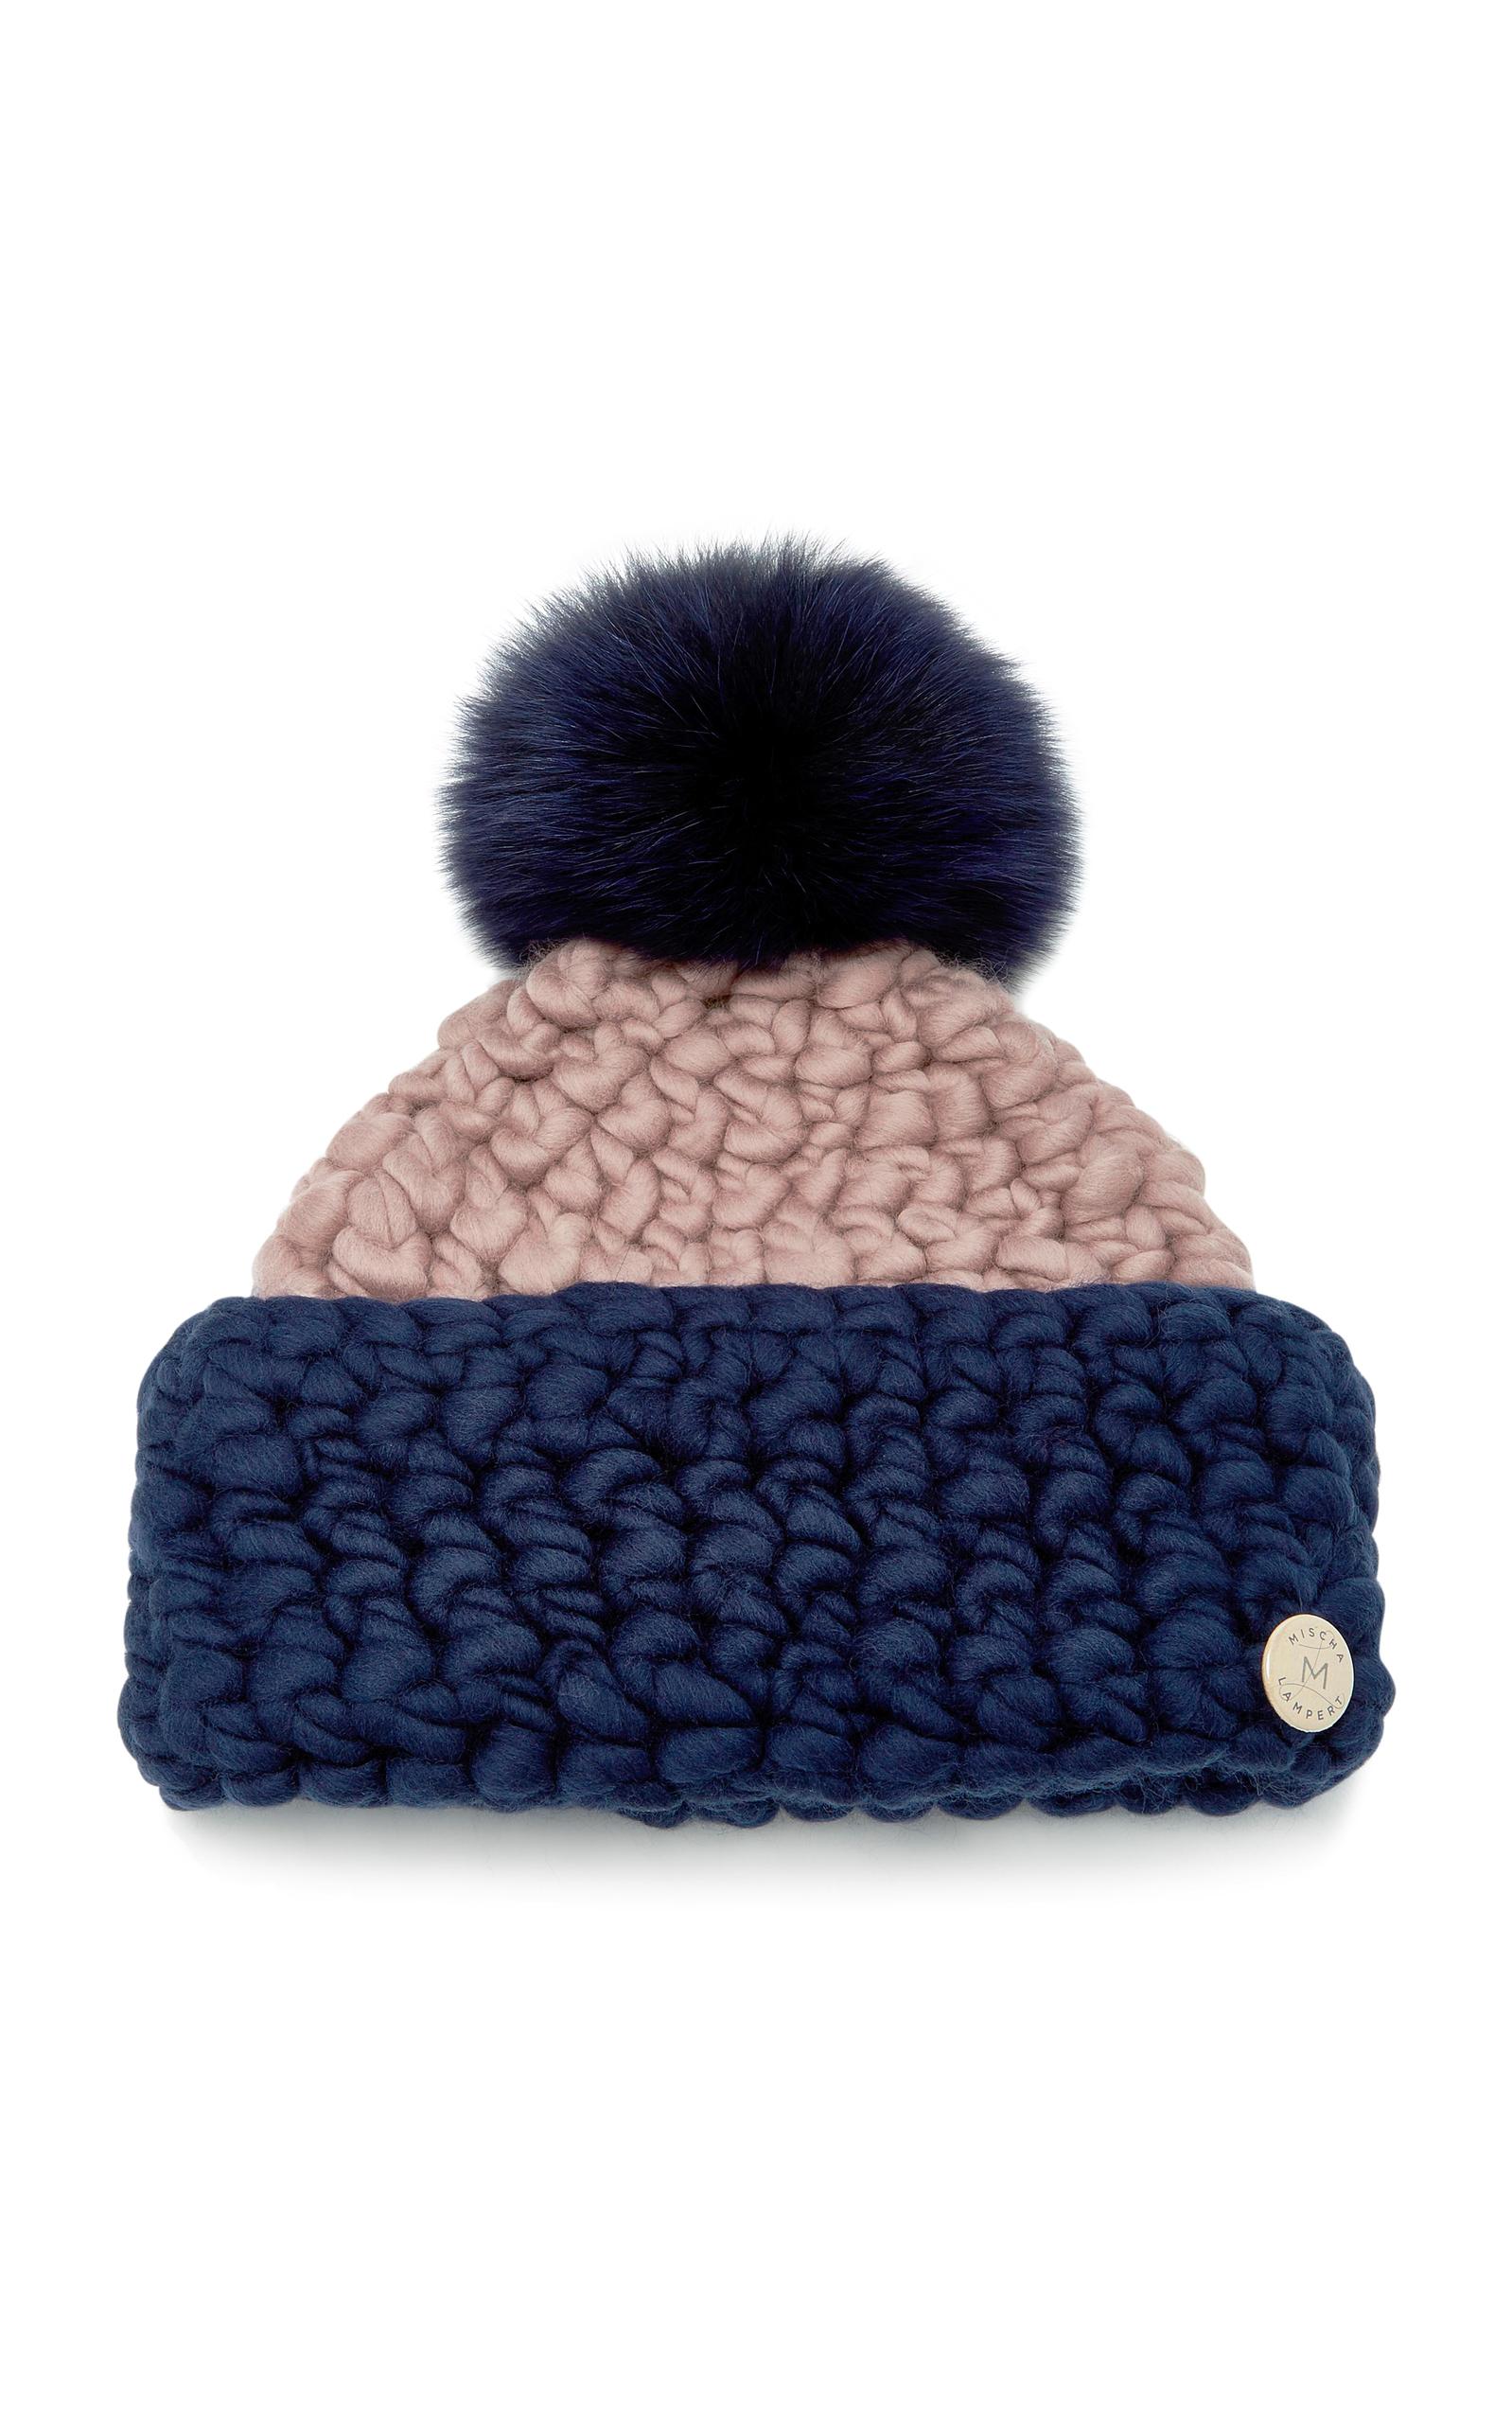 da25fa7119a Fold Fox Fur-Trimmed Merino Wool Beanie by Mischa Lampert